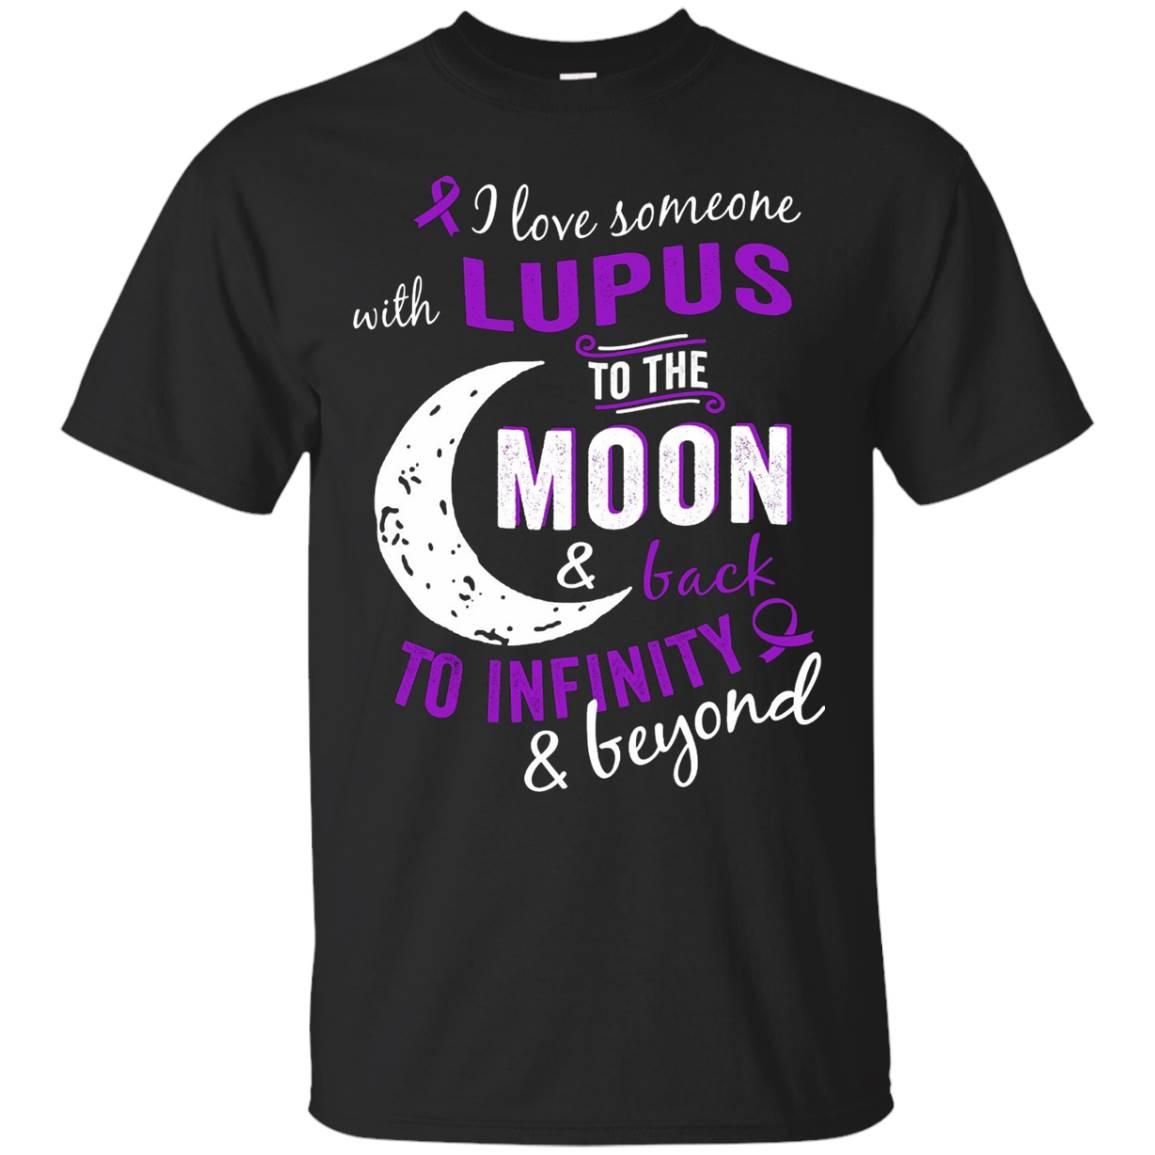 Lupus Awareness Shirts – Lupus Symptoms Shirts For Women